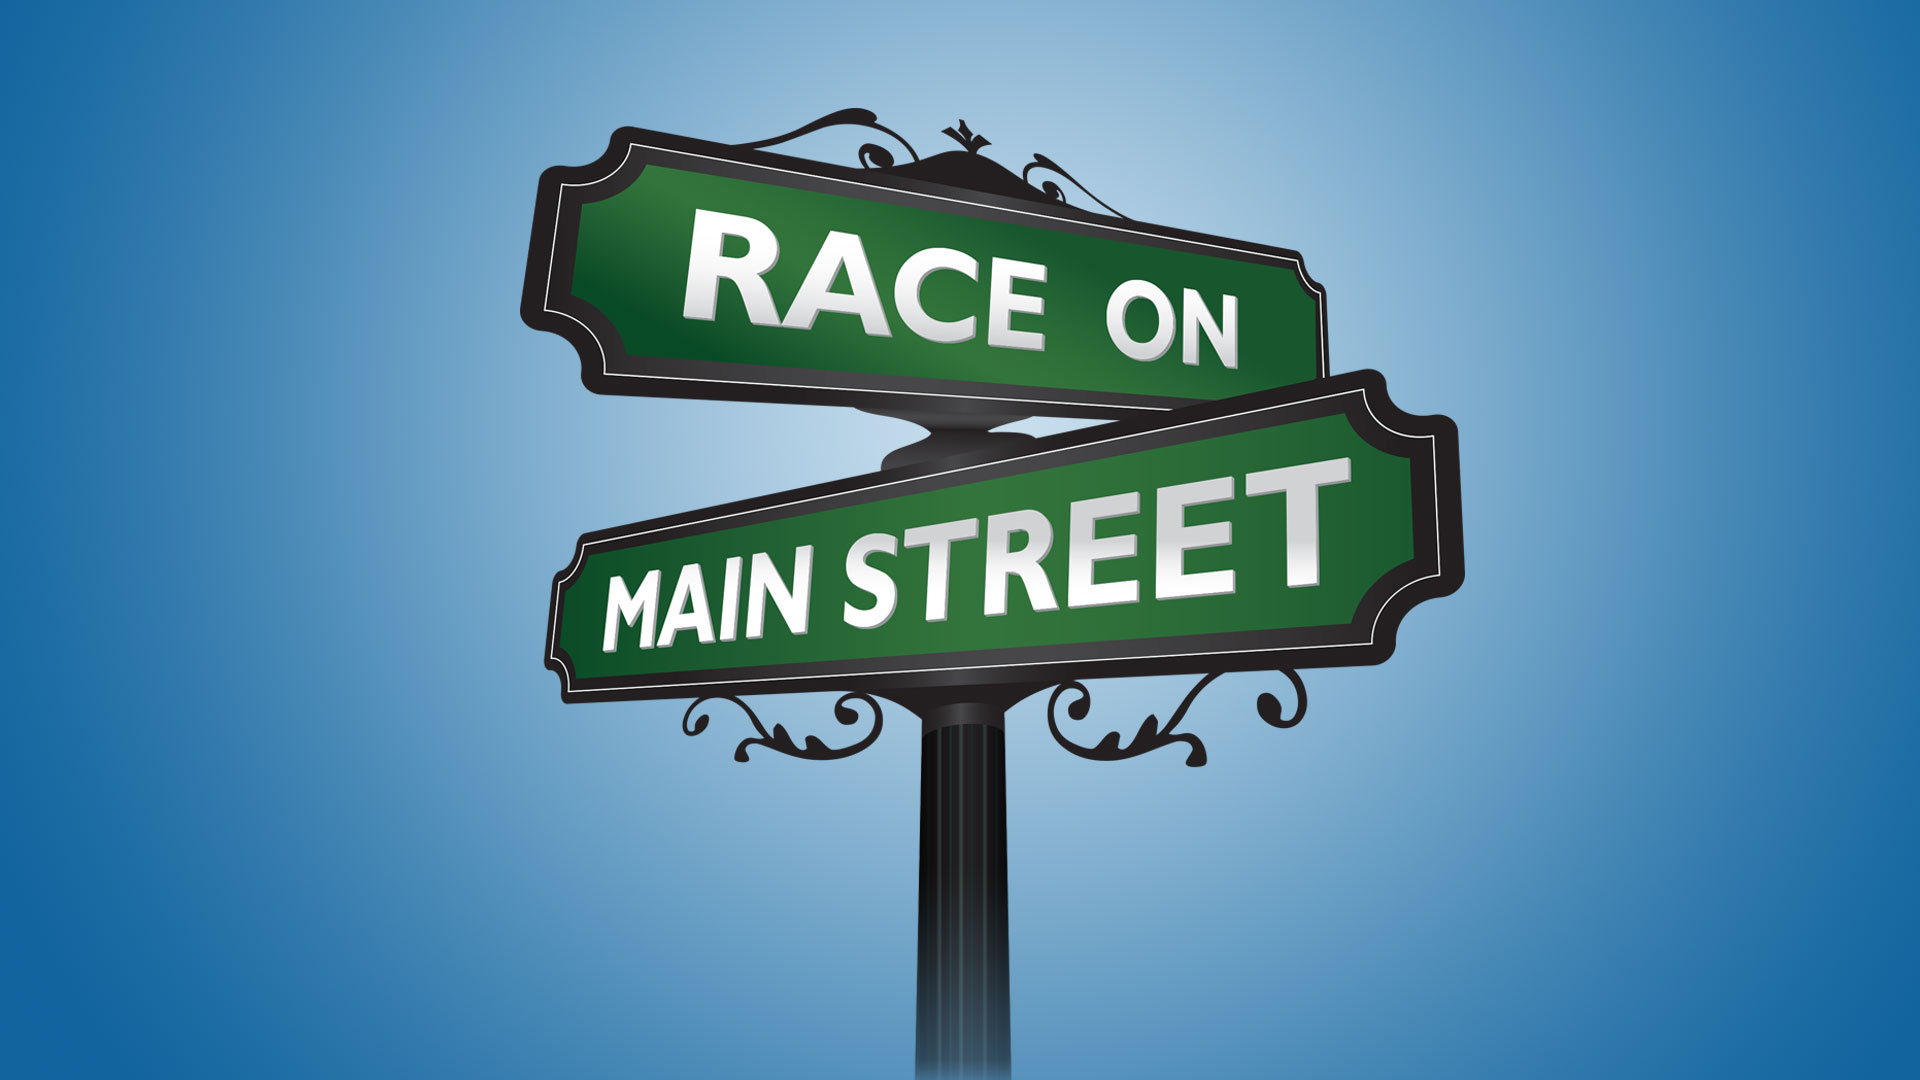 Race on Main Street Debut